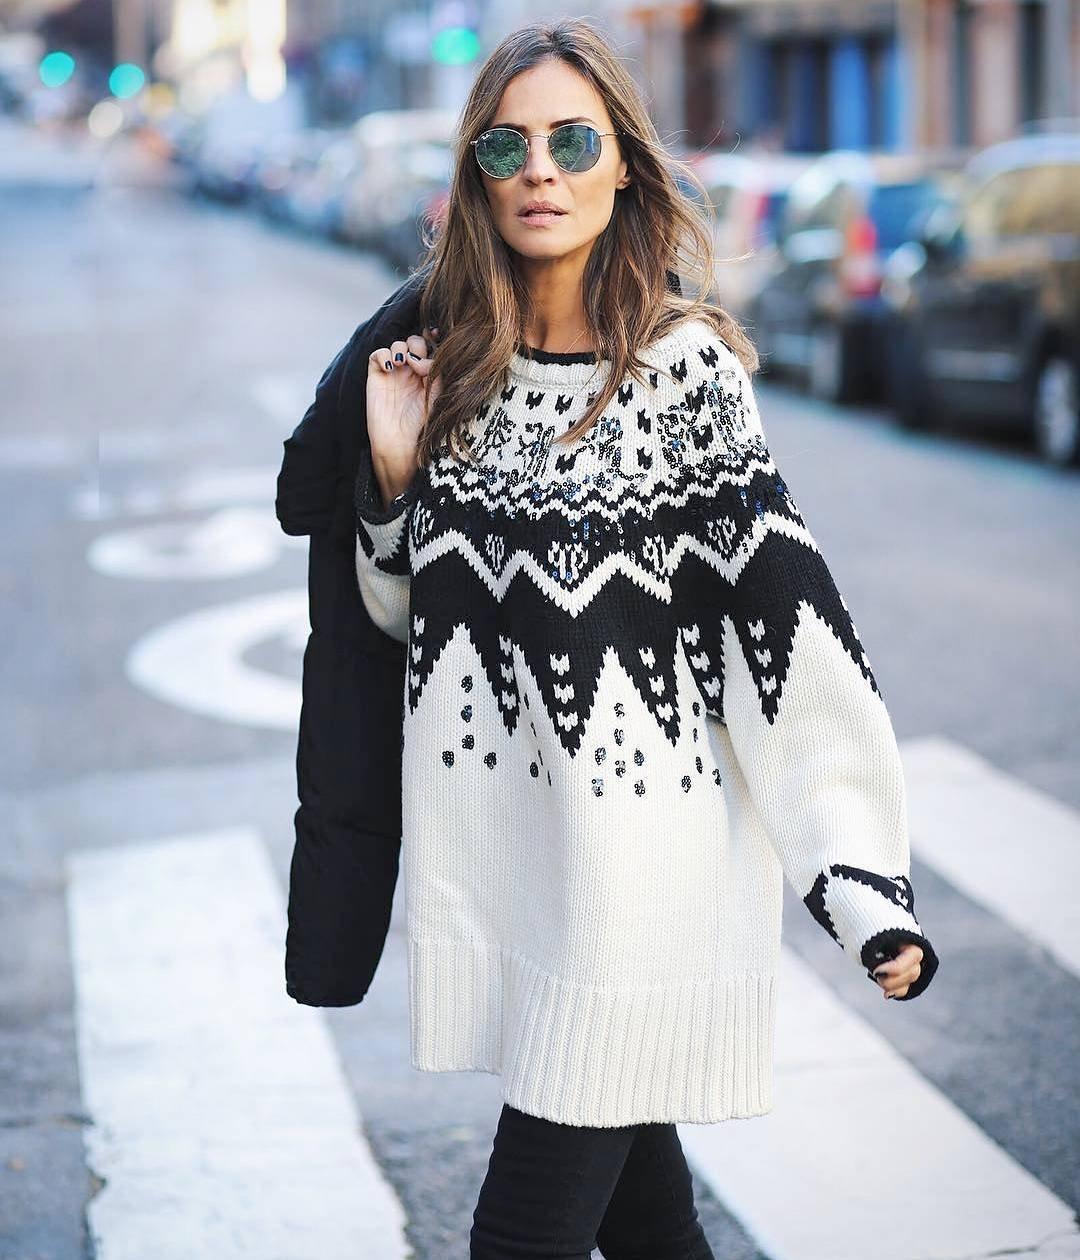 Удобство и мода: оверсайз осени 2018, лучшие идеи для всех стиляг